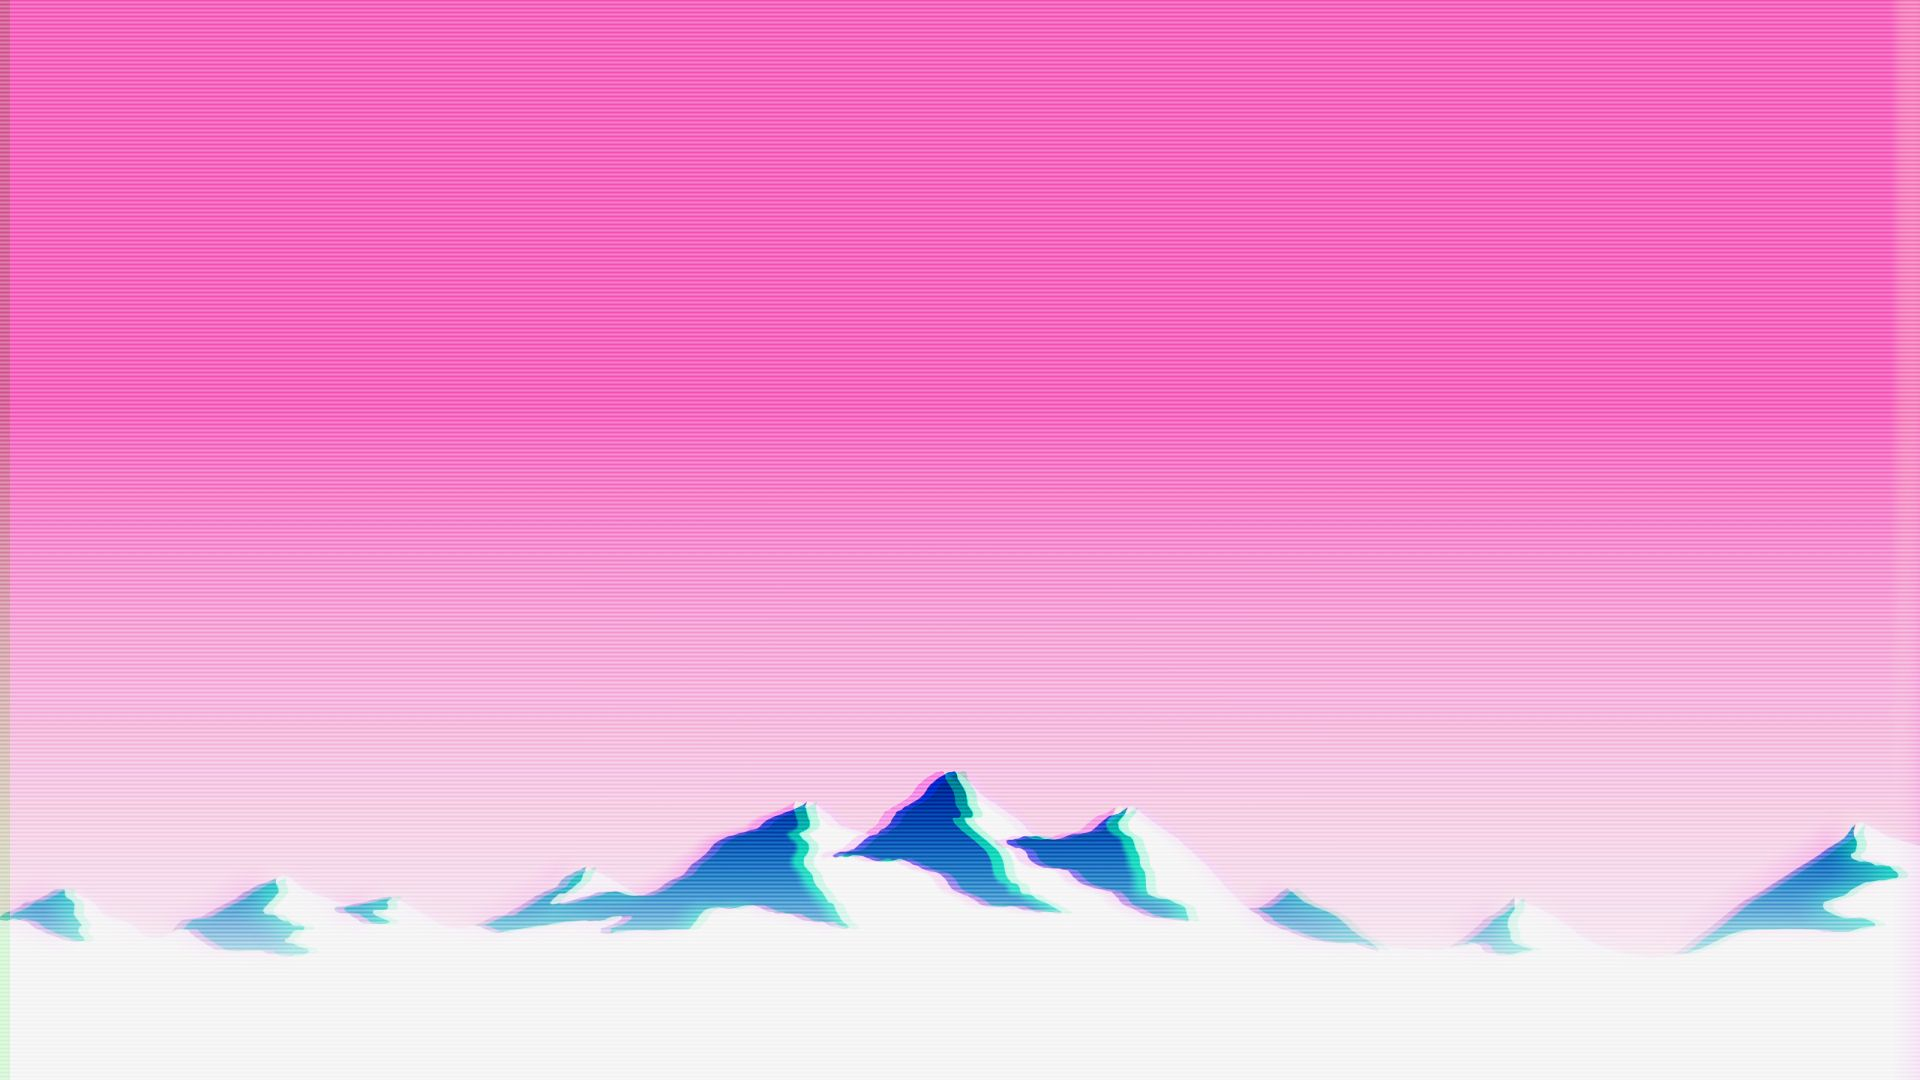 Pink Aesthetic Wallpaper 1920x1080